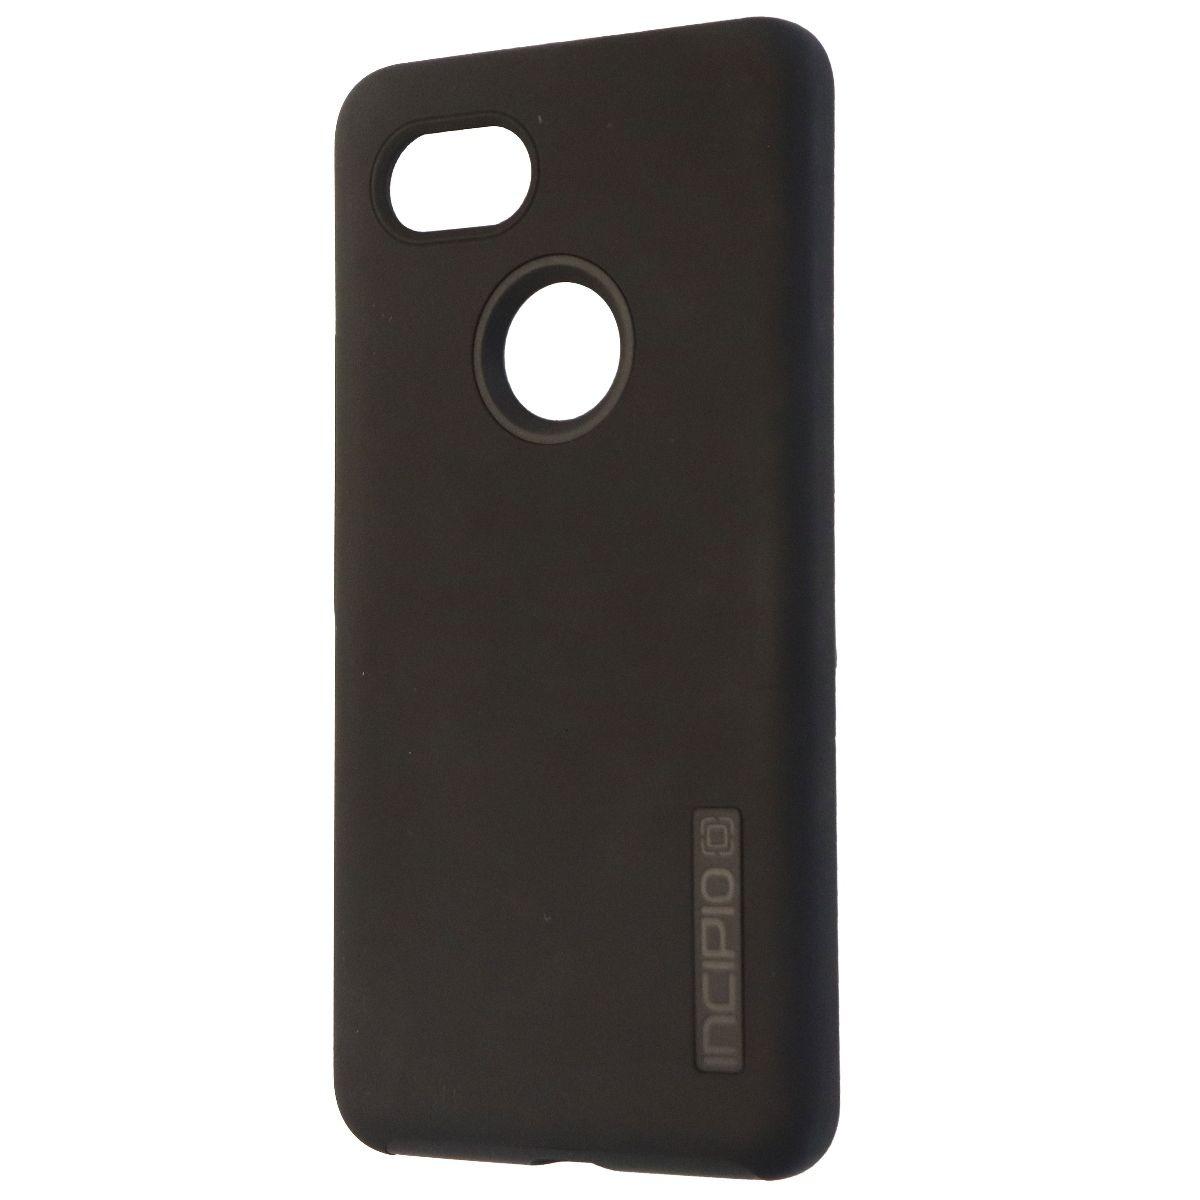 Incipio DualPro Series Dual Layer Hard Case for Google Pixel 2 XL - Matte Black